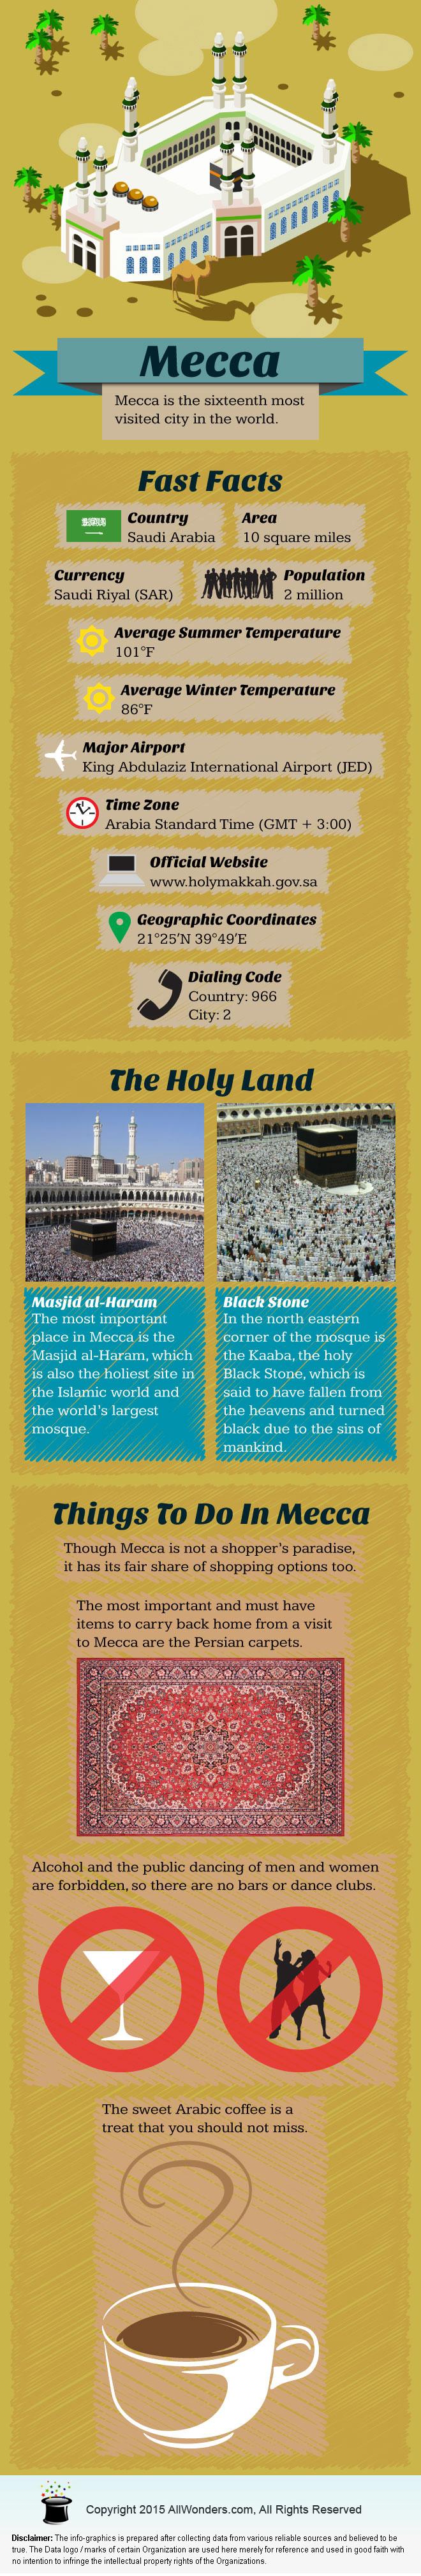 Mecca Travel Infographic